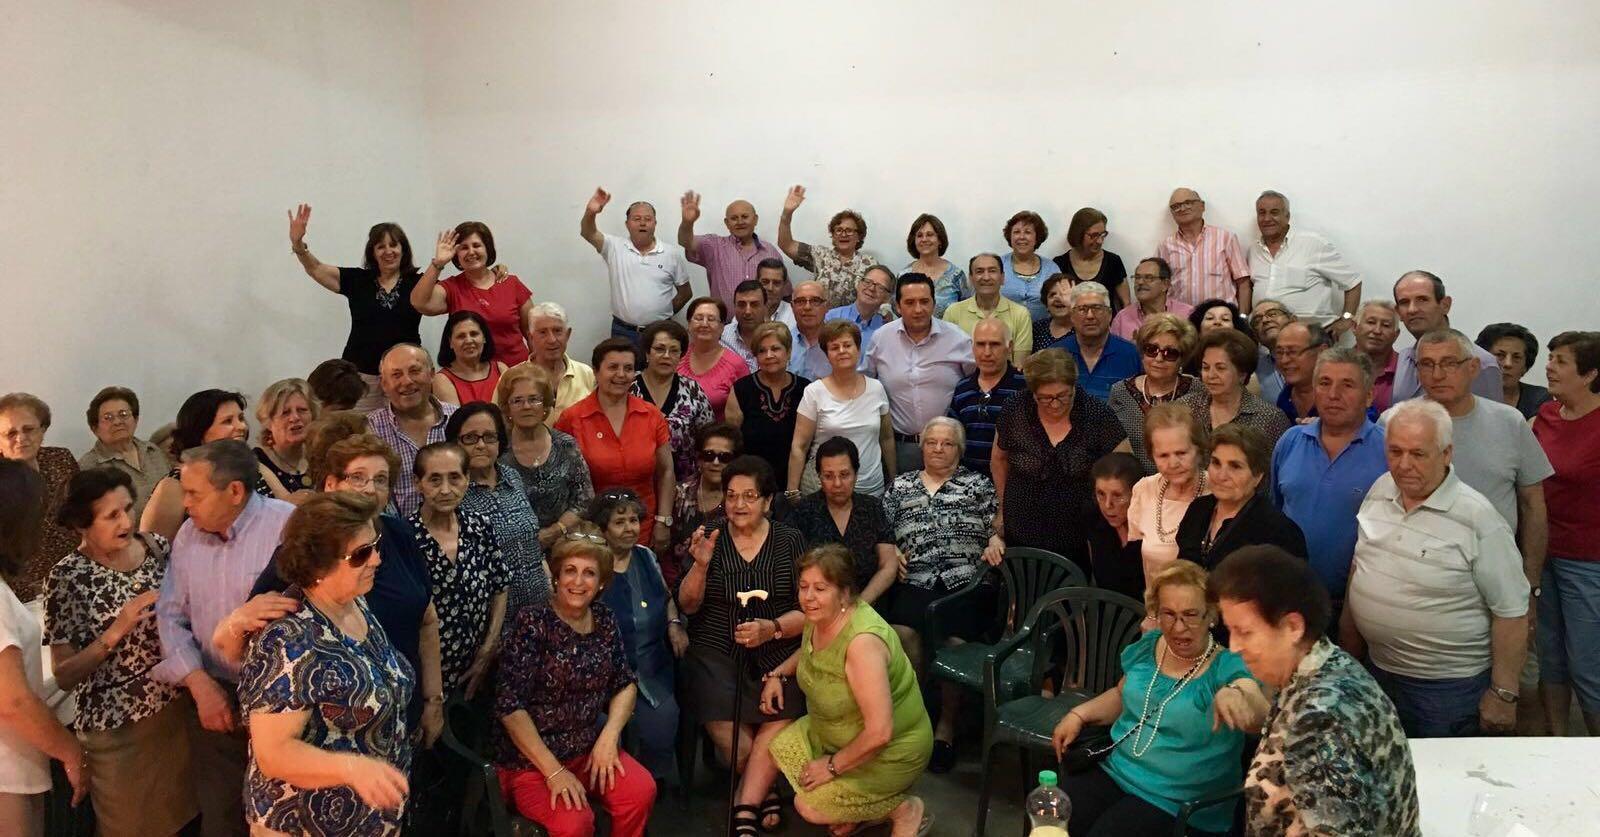 Asociación de voluntarios de personas mayores Pozohondo de Campo de Criptana